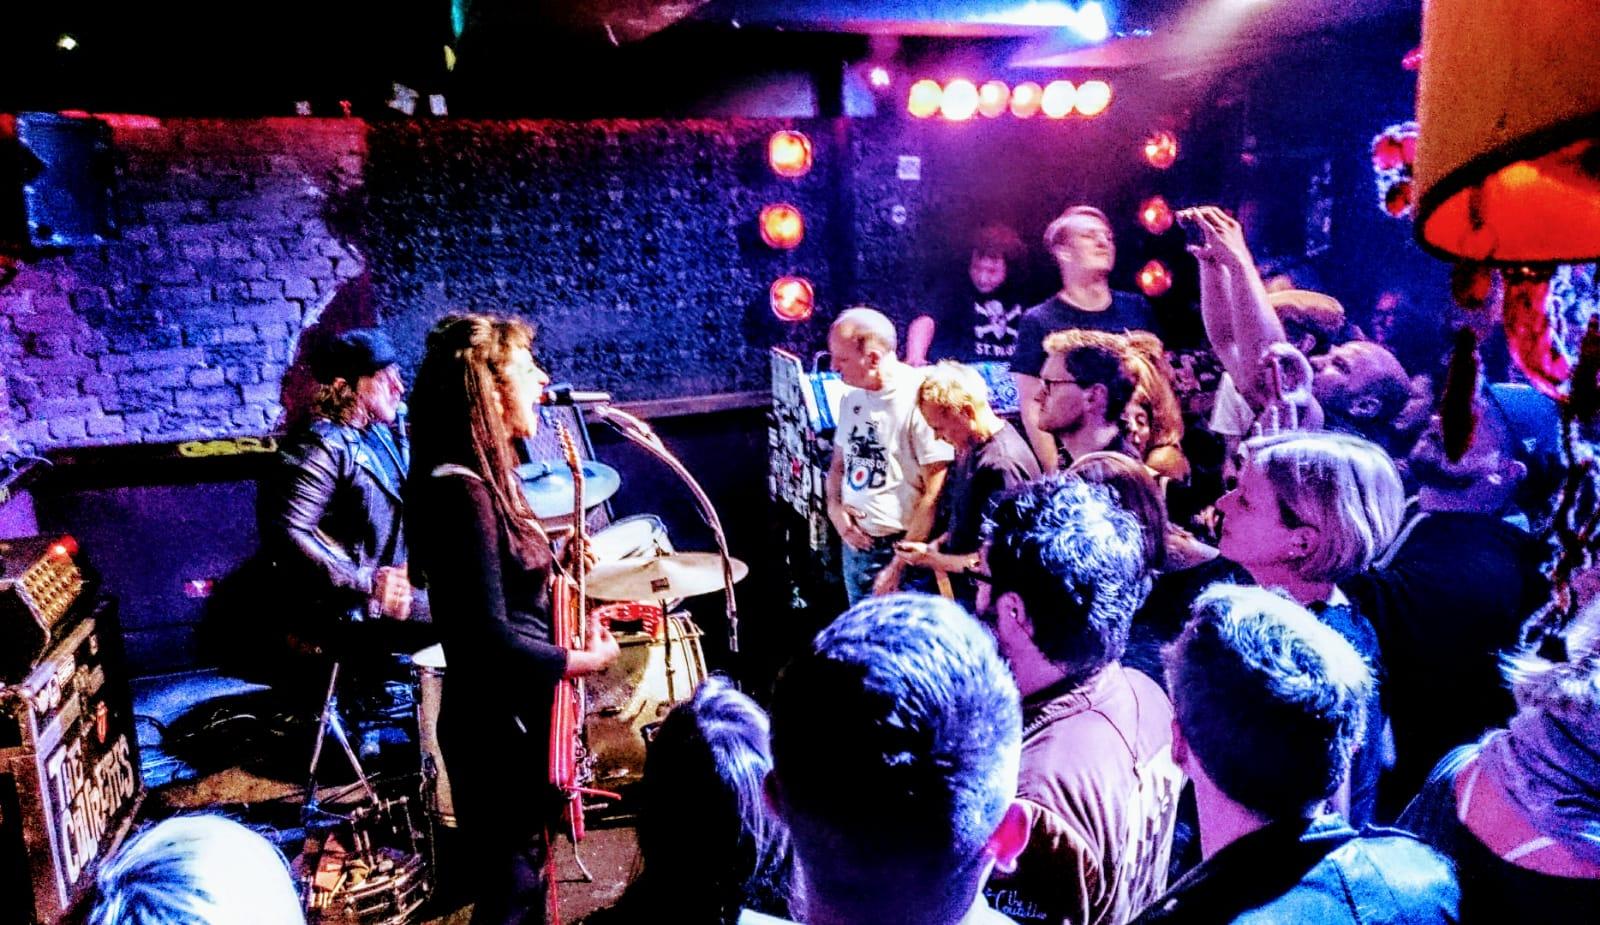 The Courettes, Pooca Bar, St. Pauli, Garage, Sixties, Rock 'n' Roll, concert, live, Club, crowd